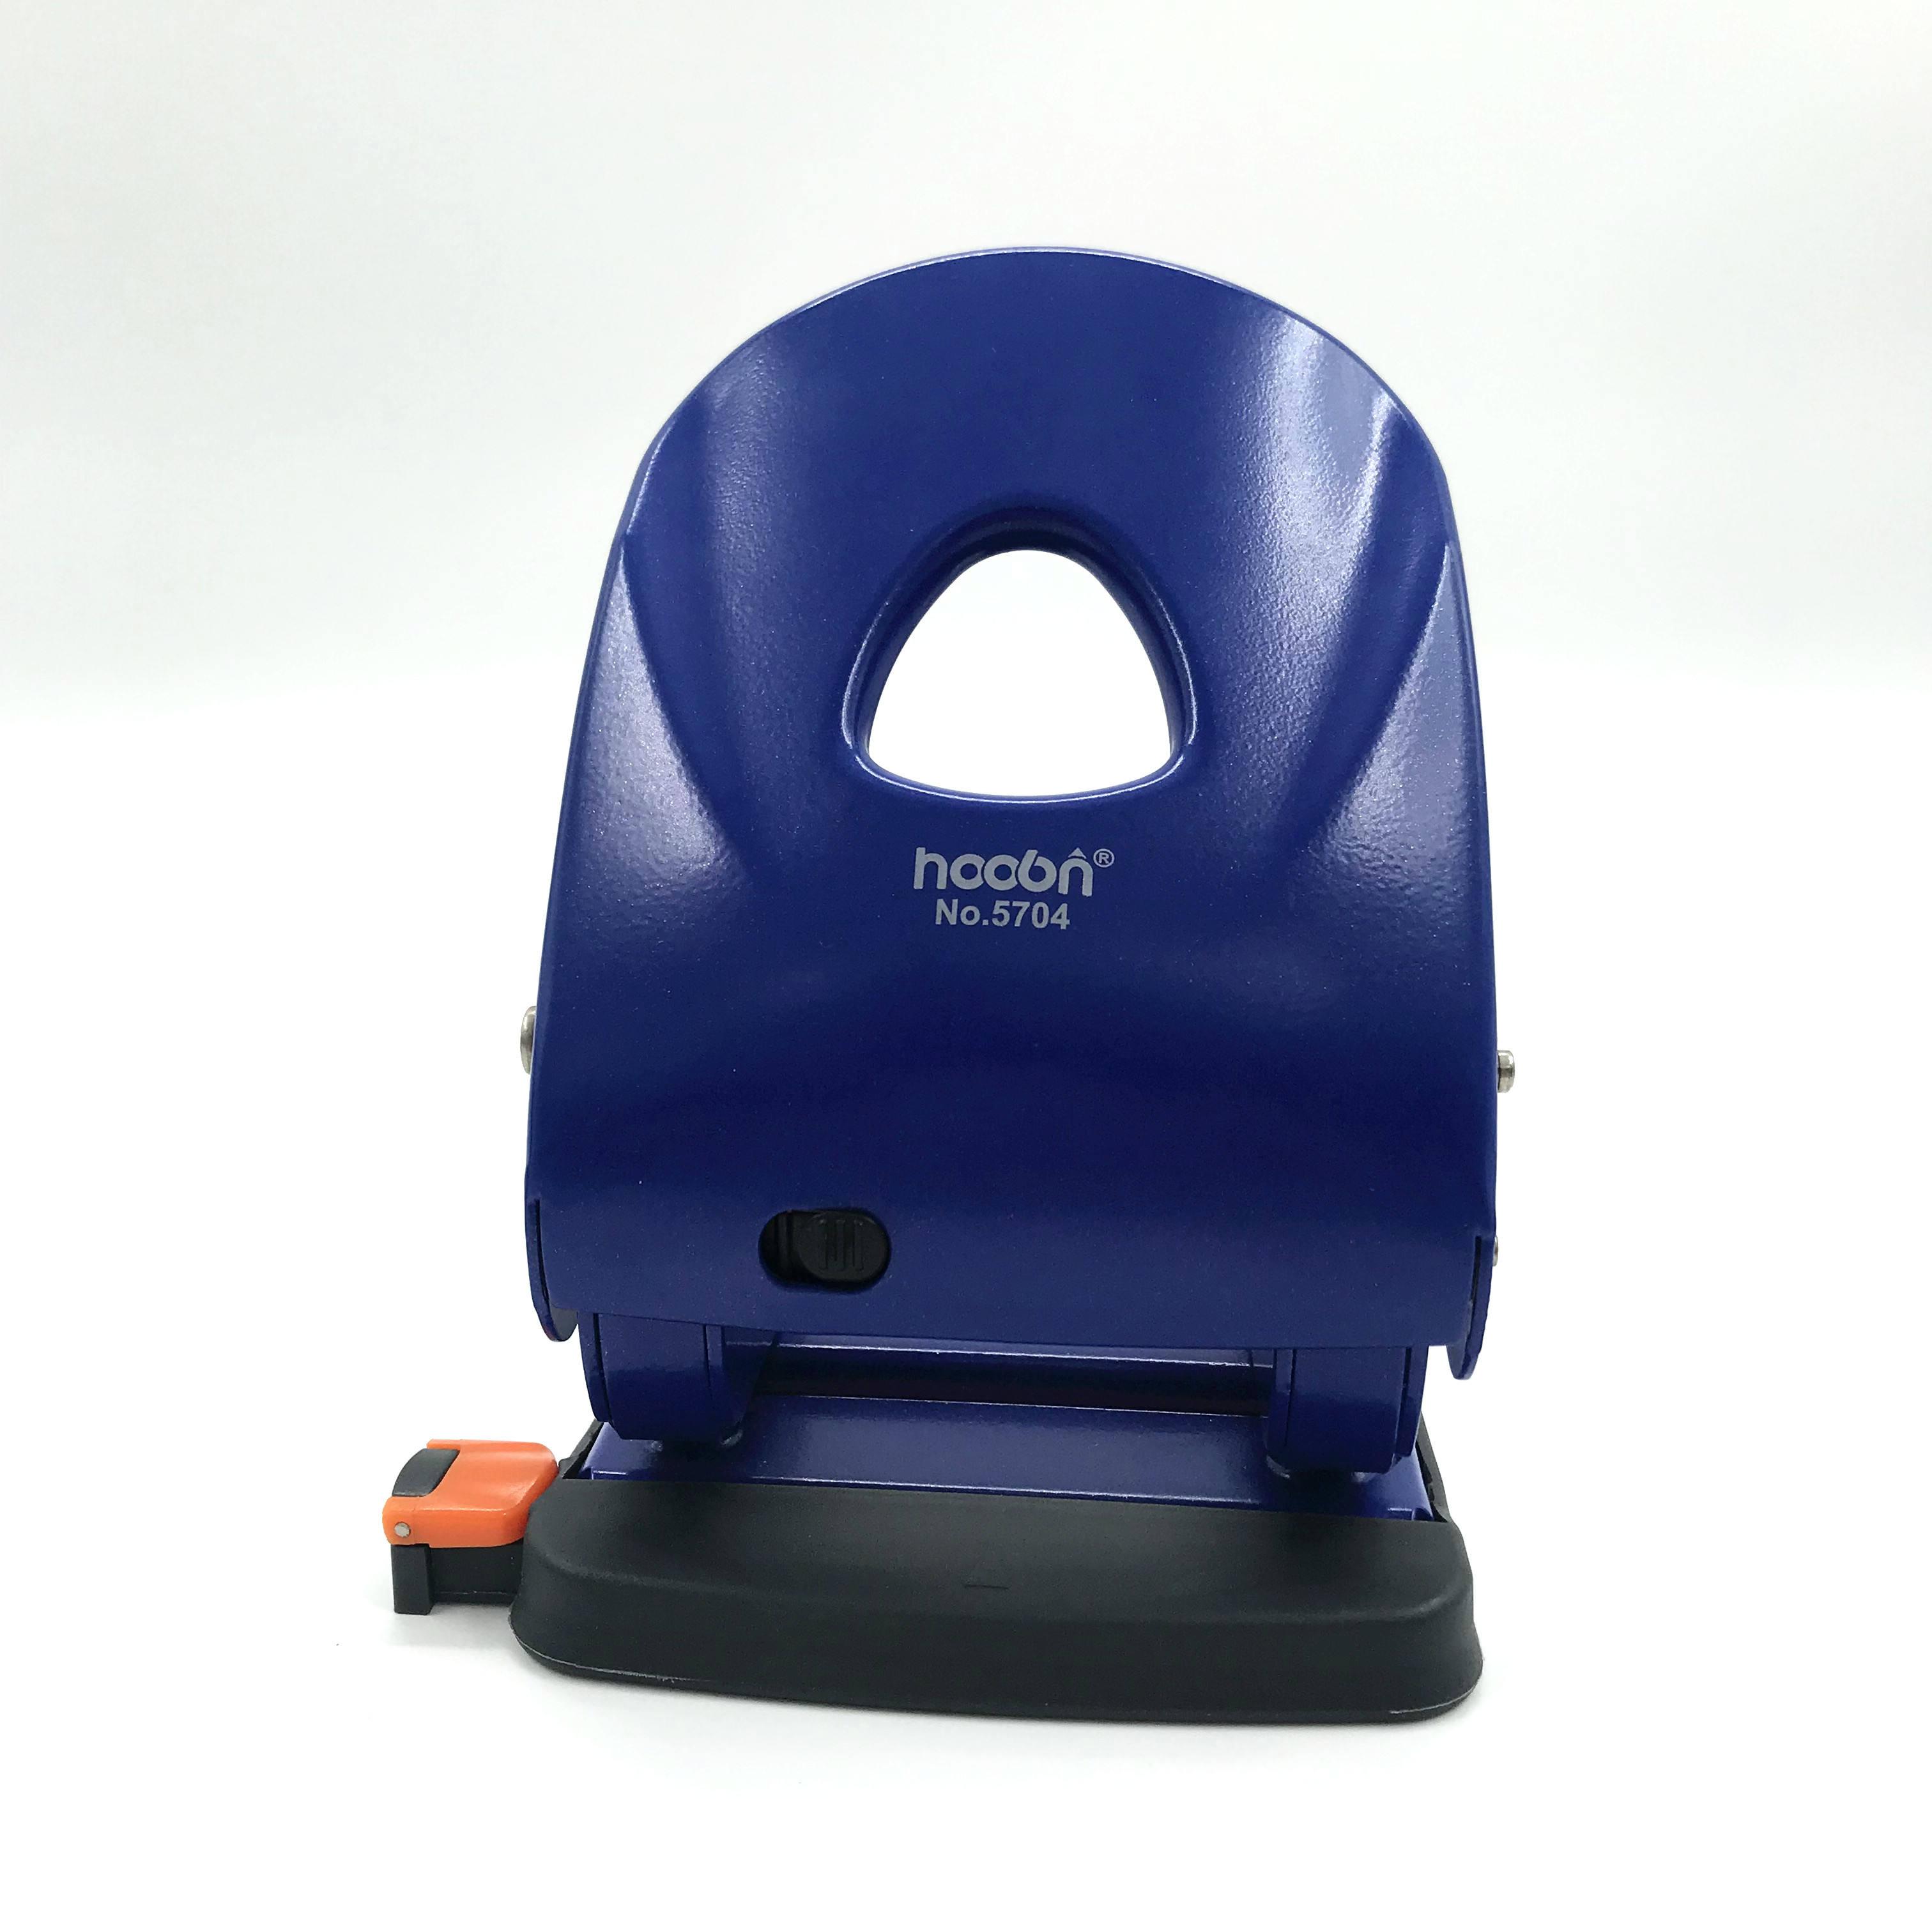 Negro, Negro, Metal, A4 5Star 918788 Perforador de papel